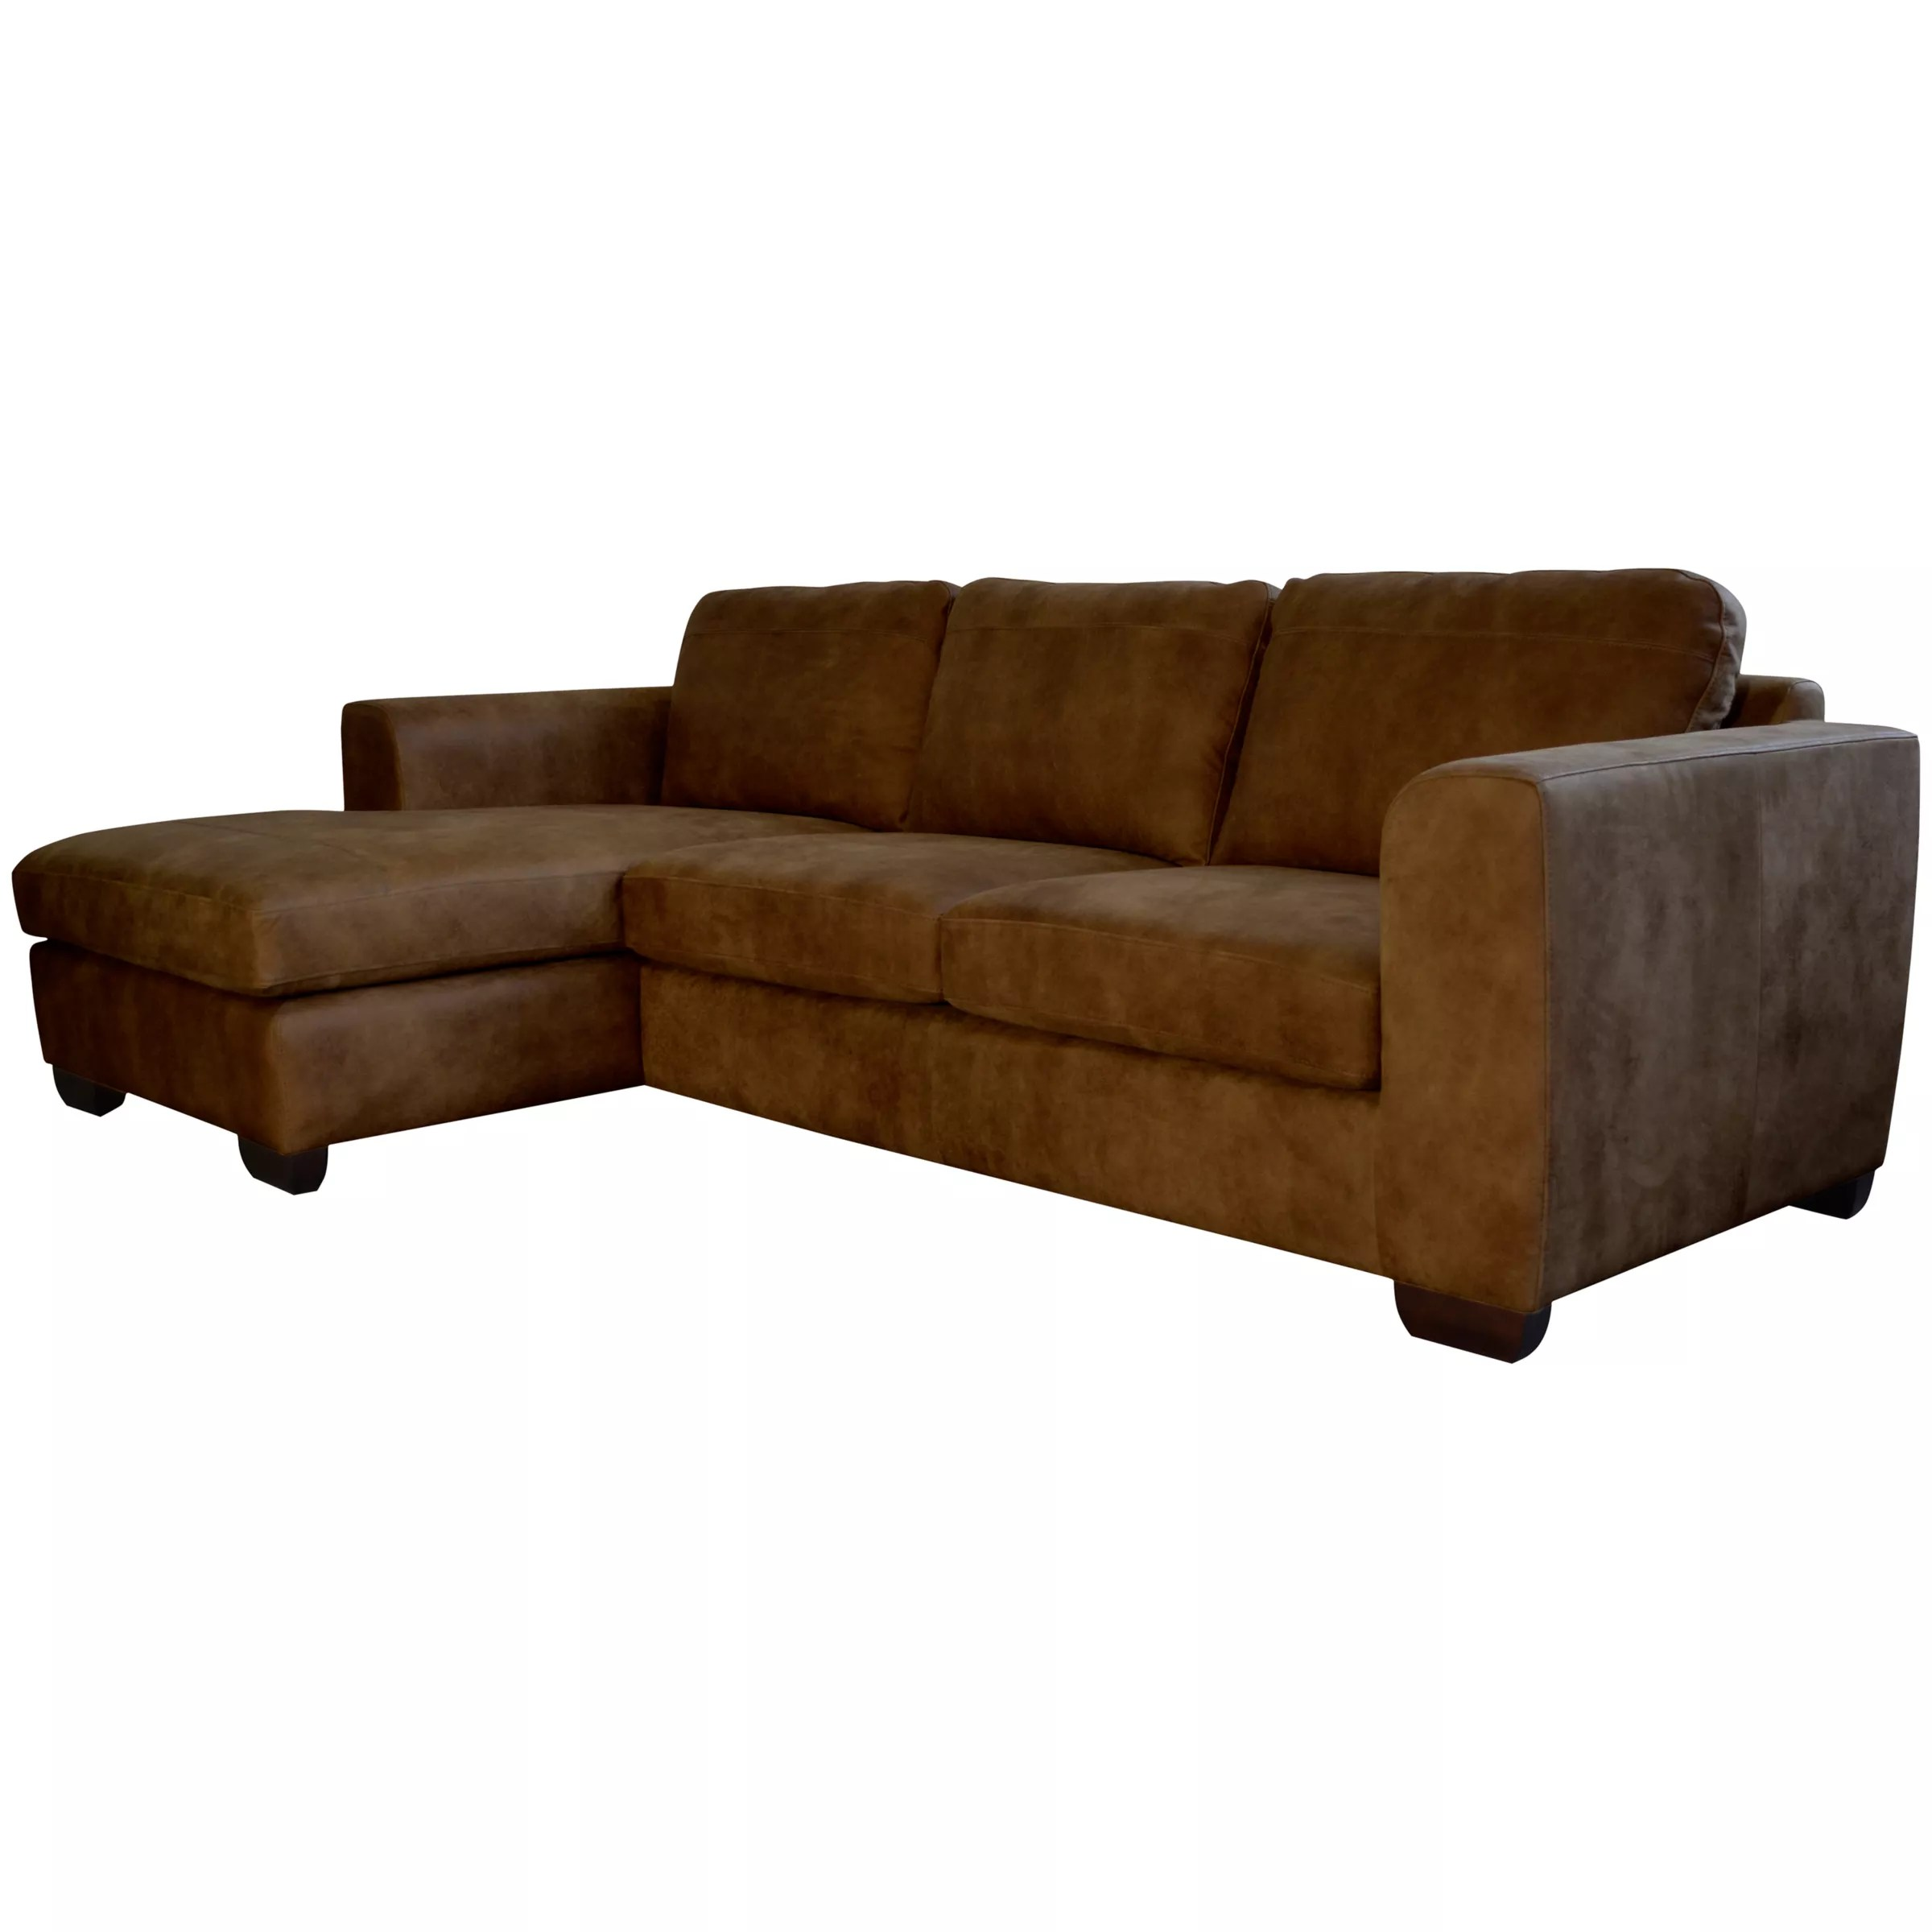 felix leather lh corner chaise sofa pearsall for sale john lewis lhf ashanti at